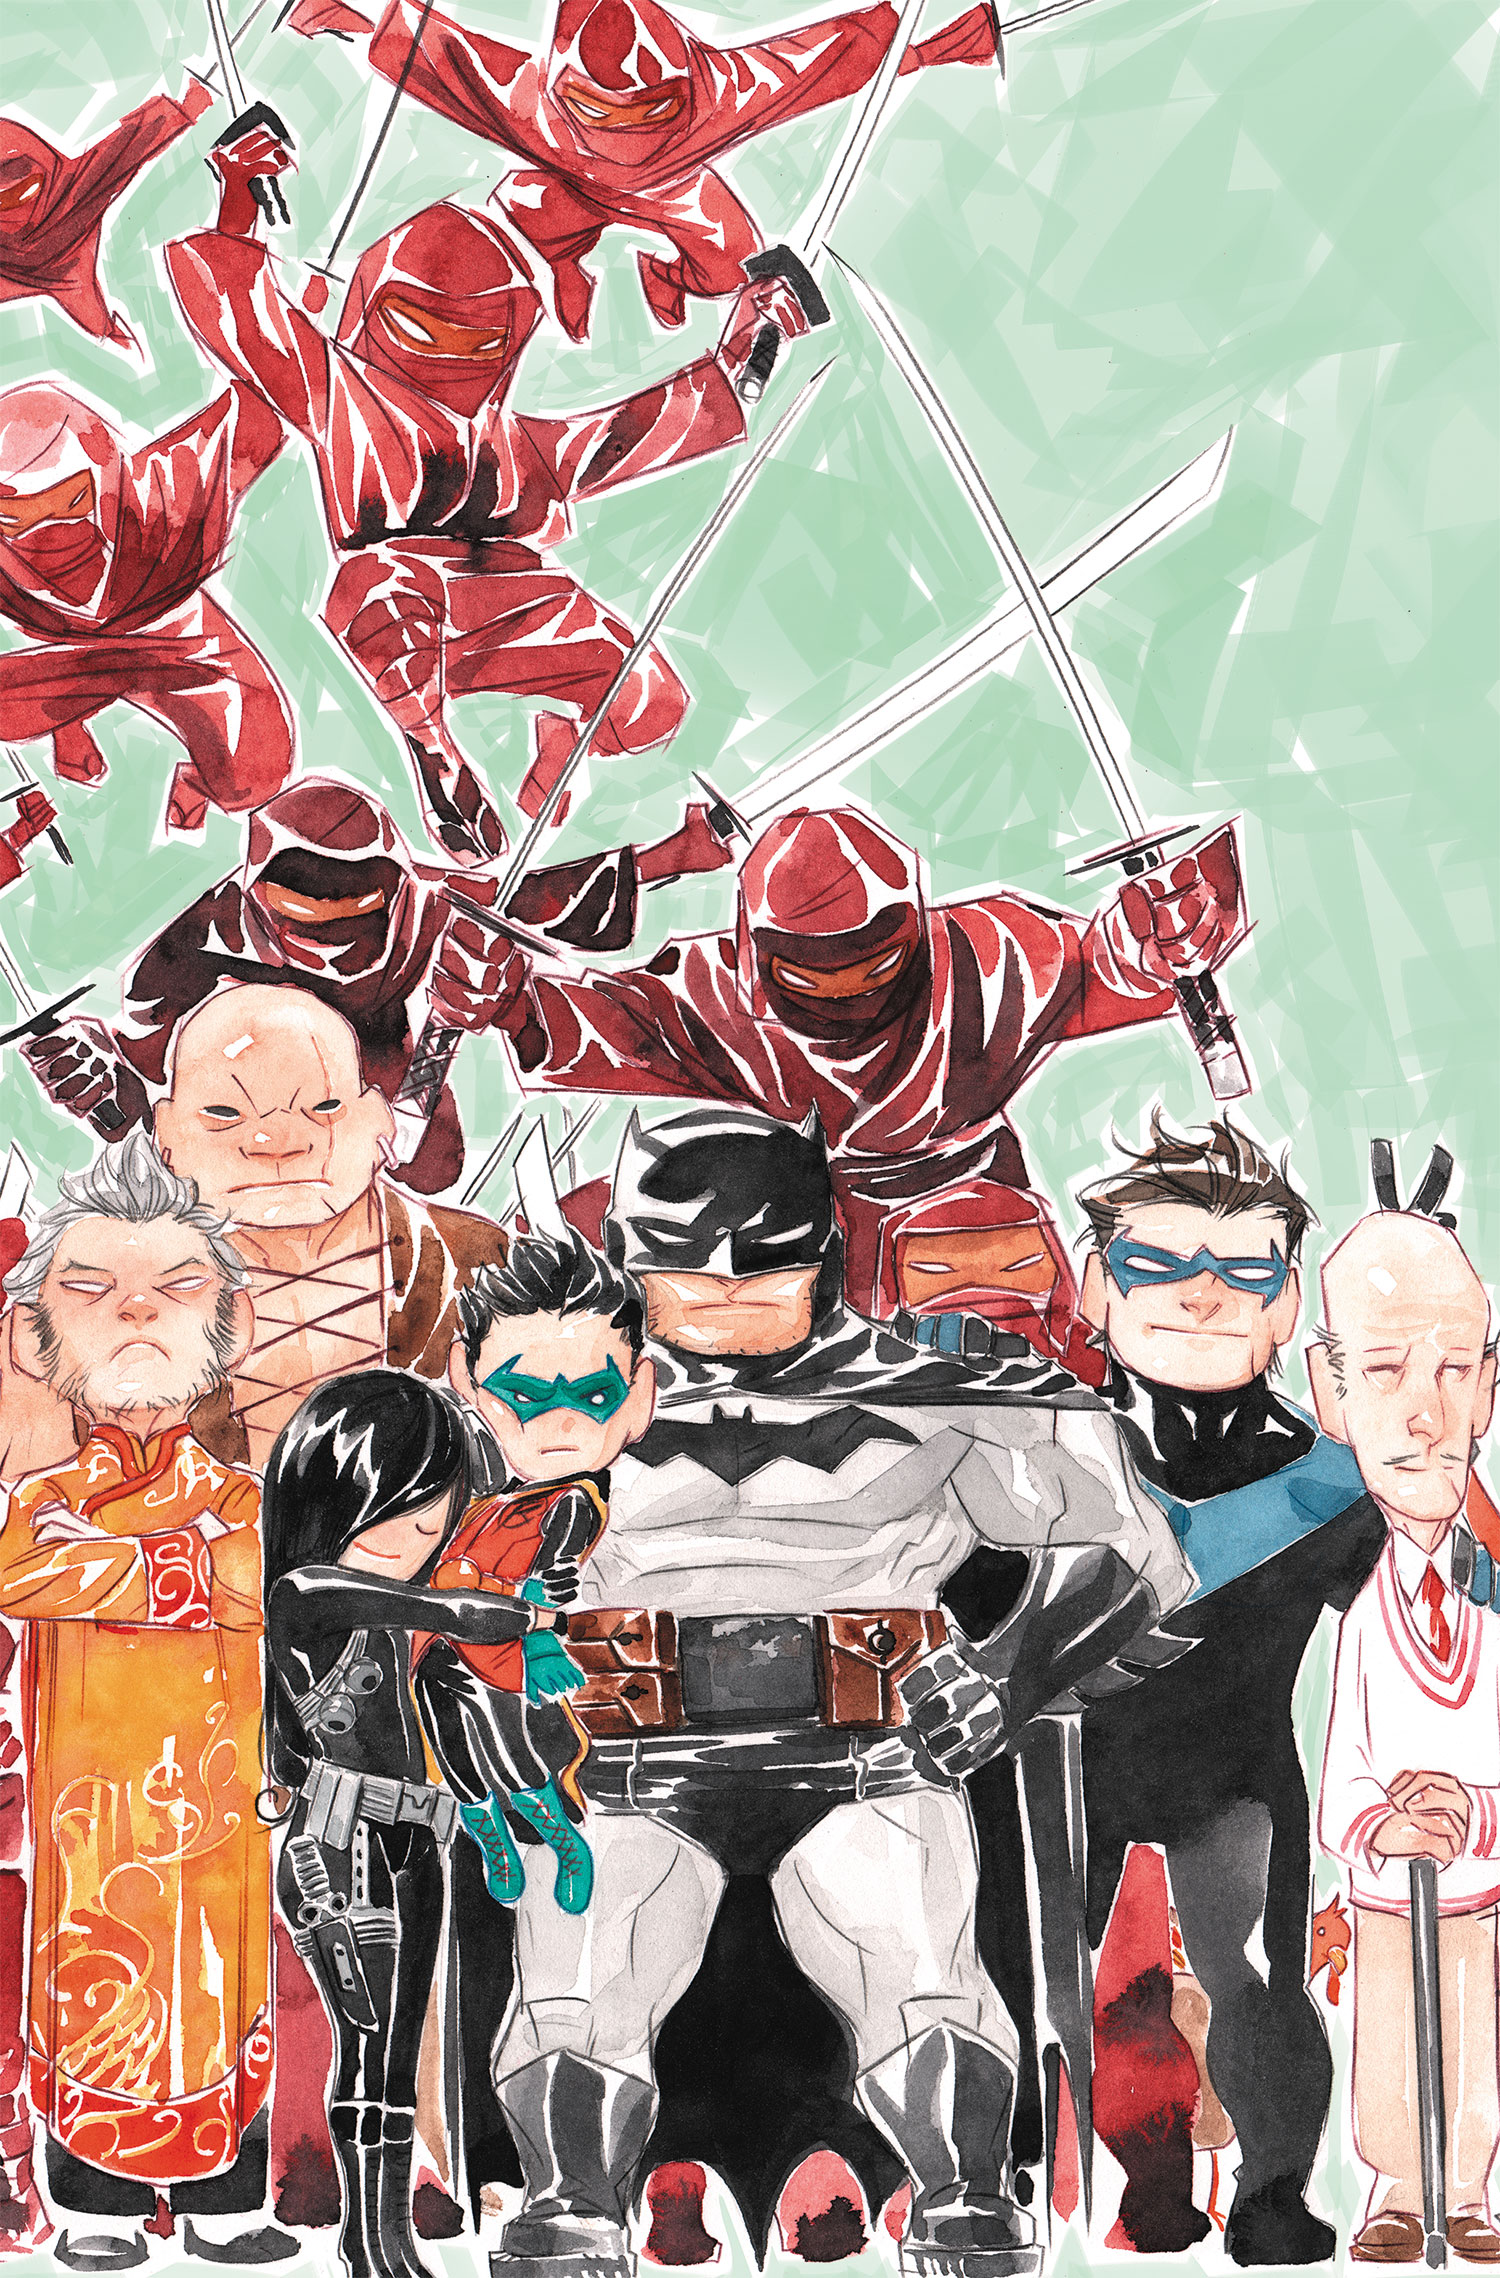 http://www.pastemagazine.com/articles/BatmanLilGotham.jpg